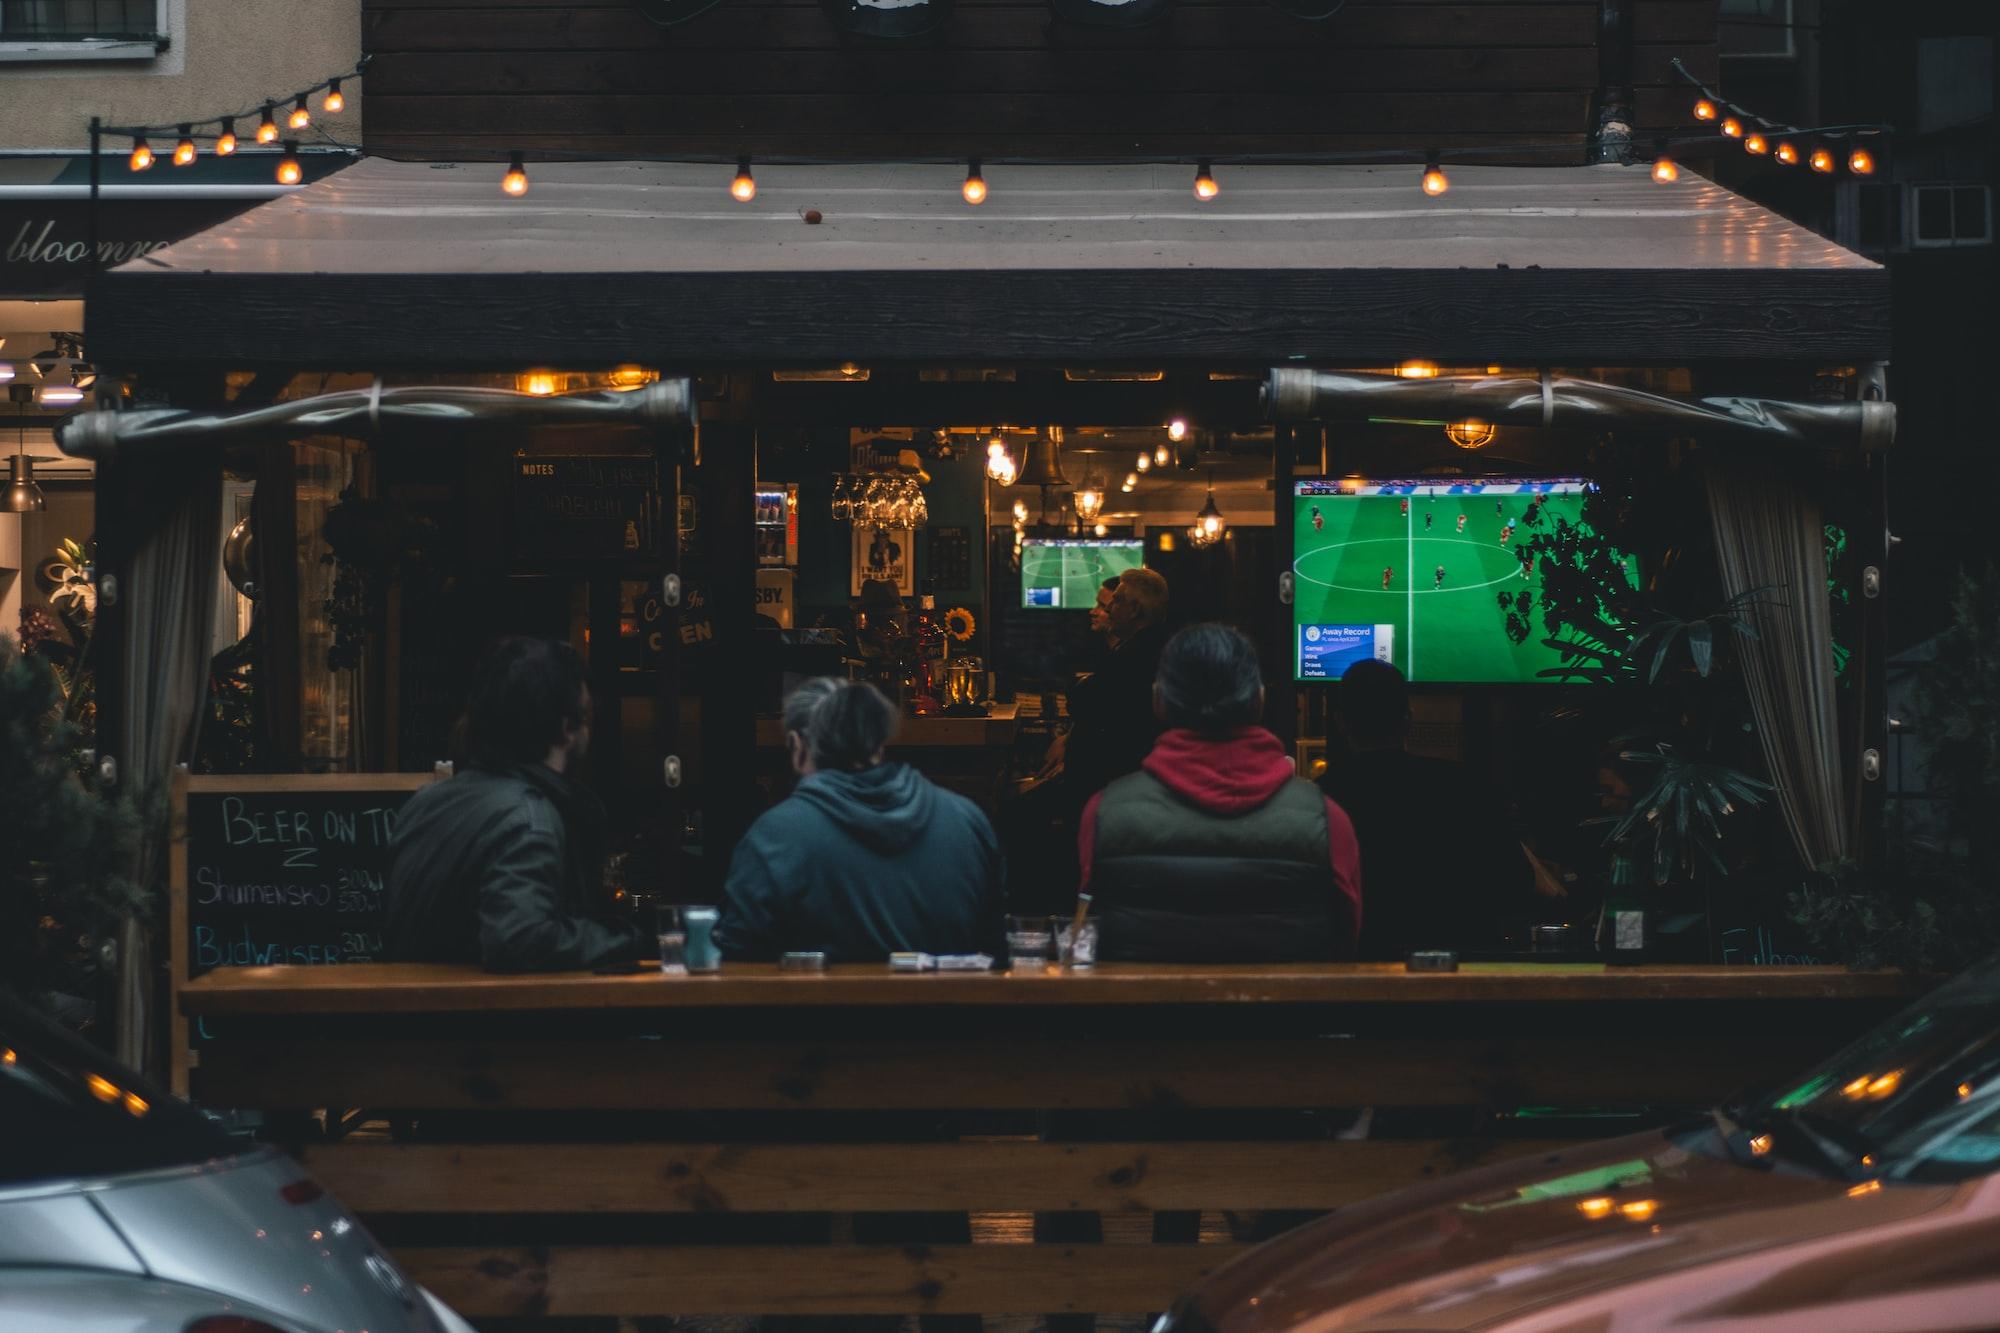 Watch Football Focus on BBC iPlayer Overseas